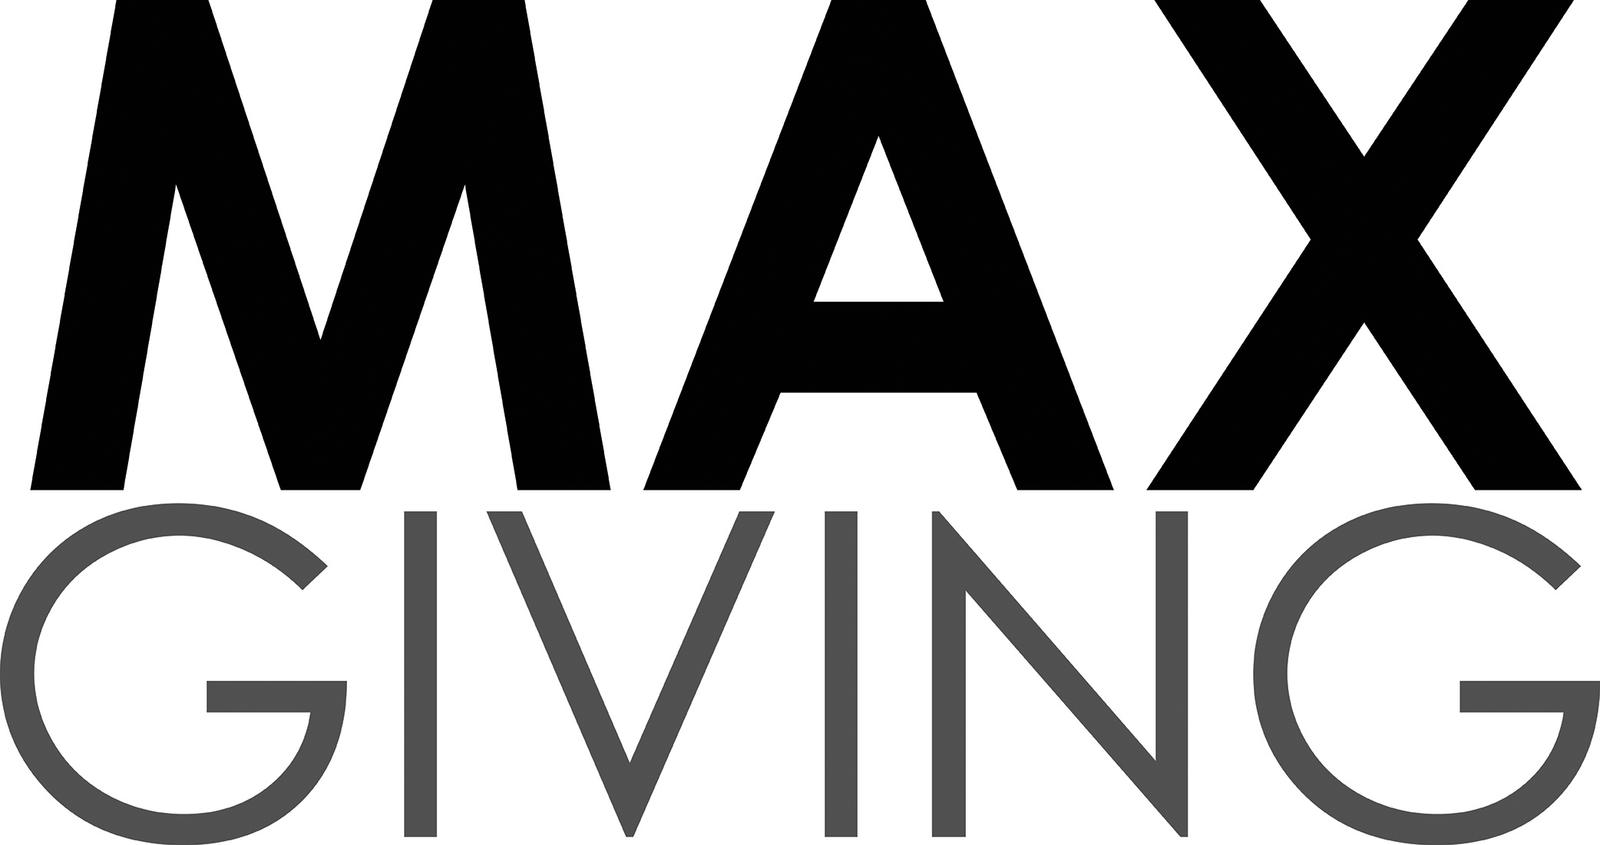 Maxgiving_logo.png